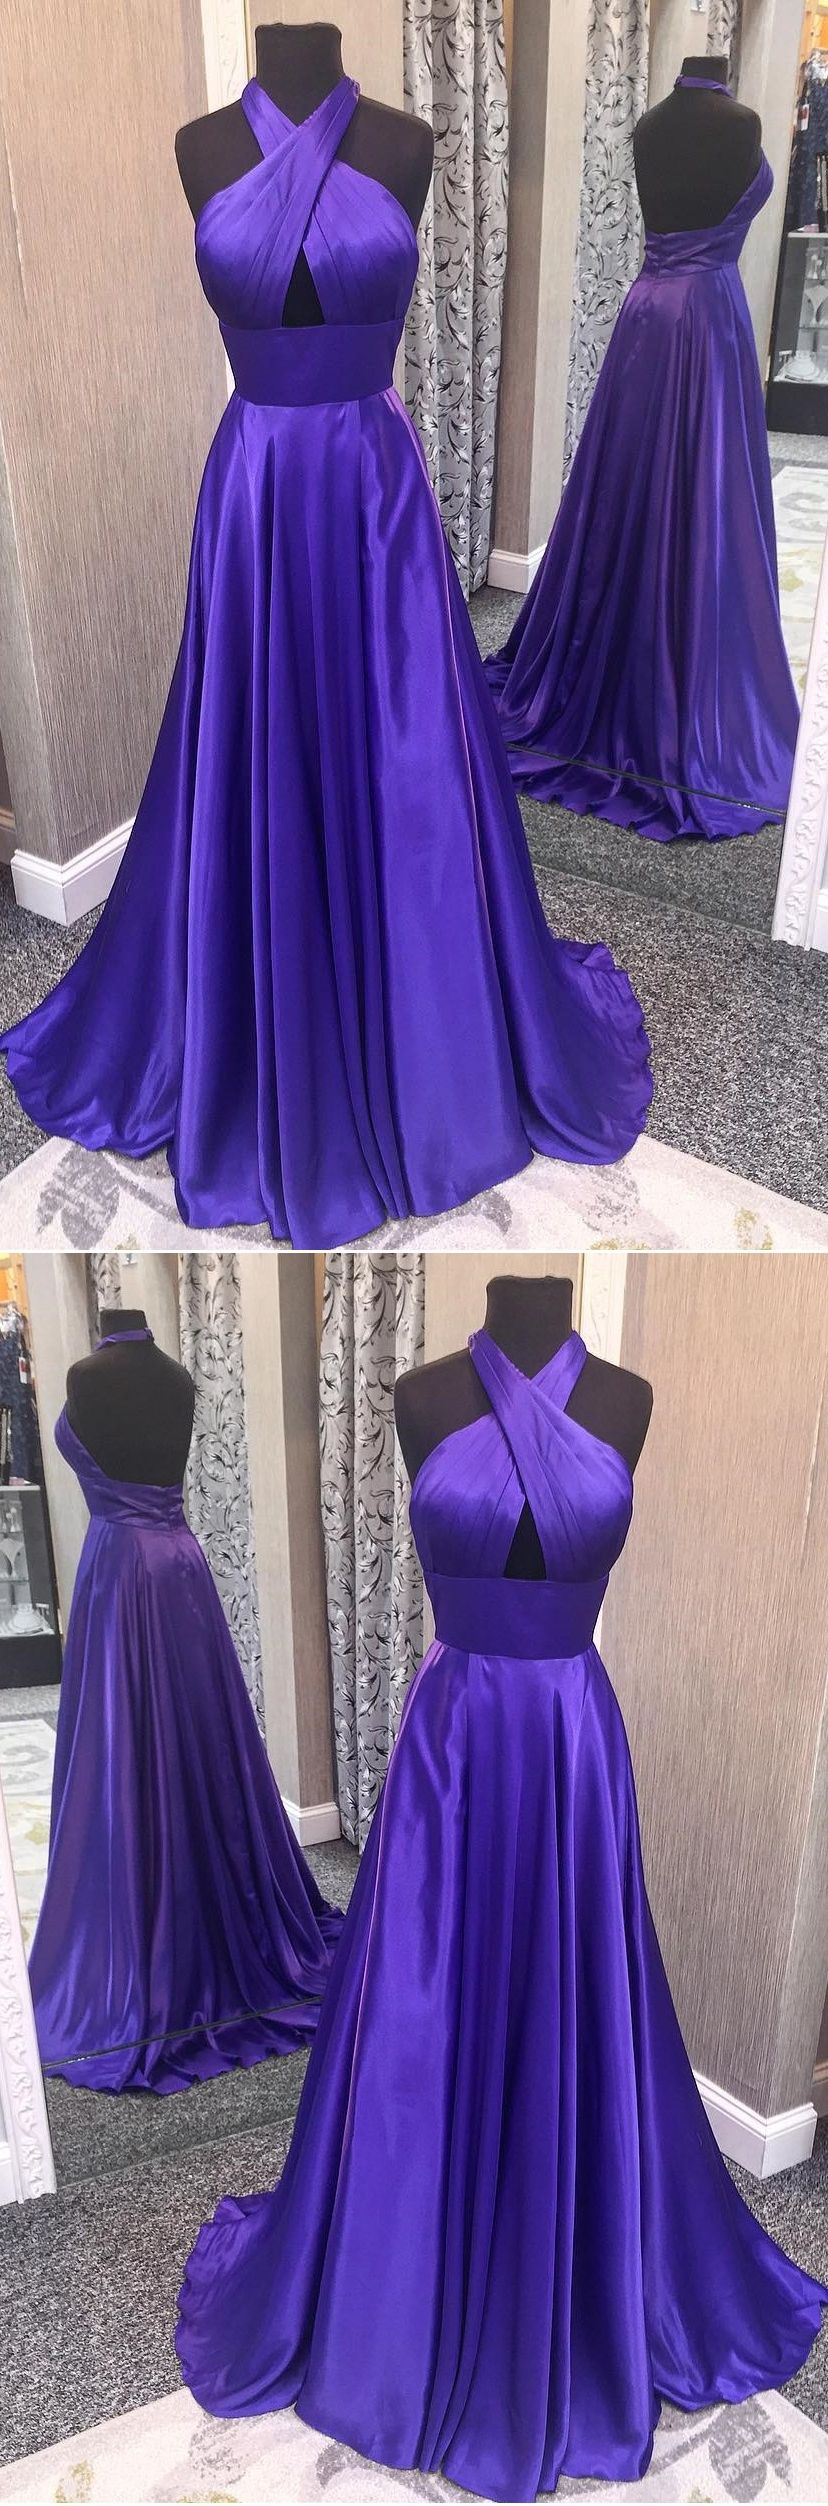 Long prom dresses halter aline floorlength long prom dress chic